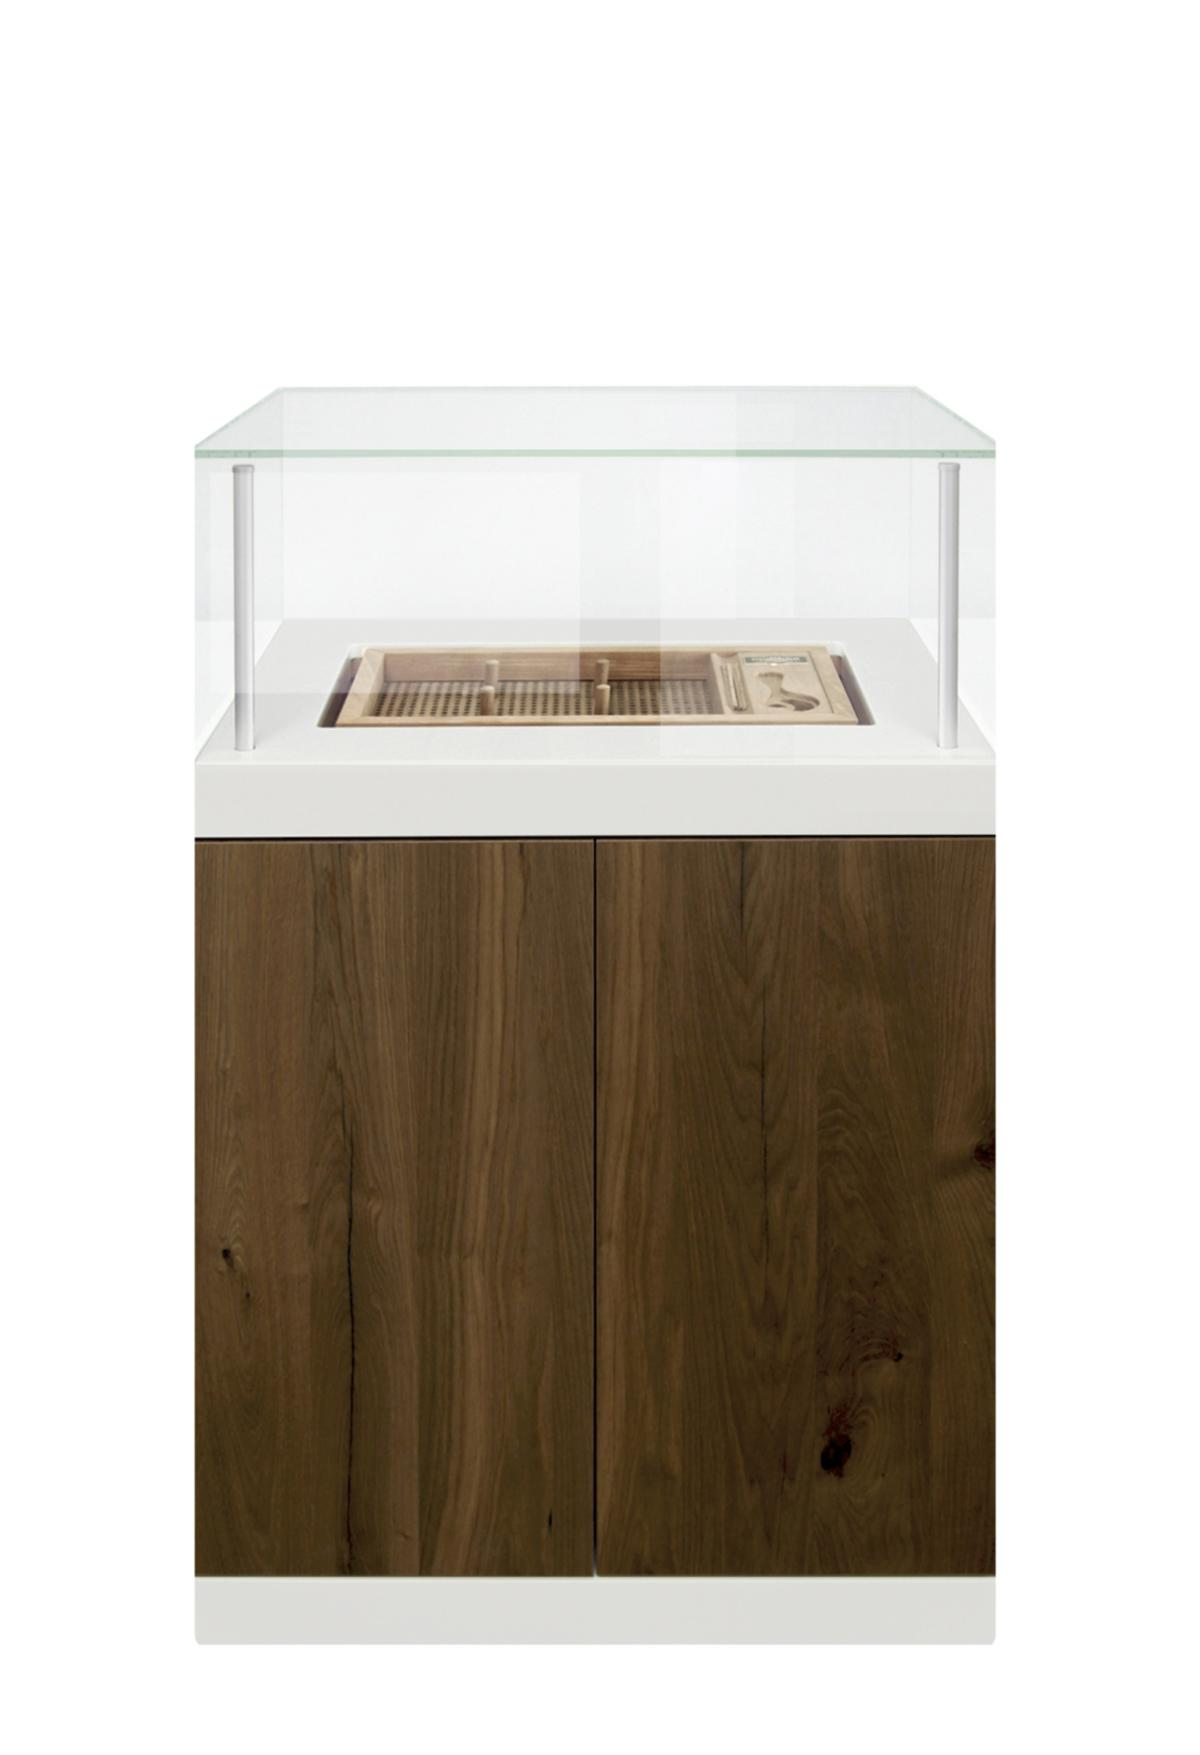 Gerber Humidor Ascension Medium Eiche Antik Kranz Corian